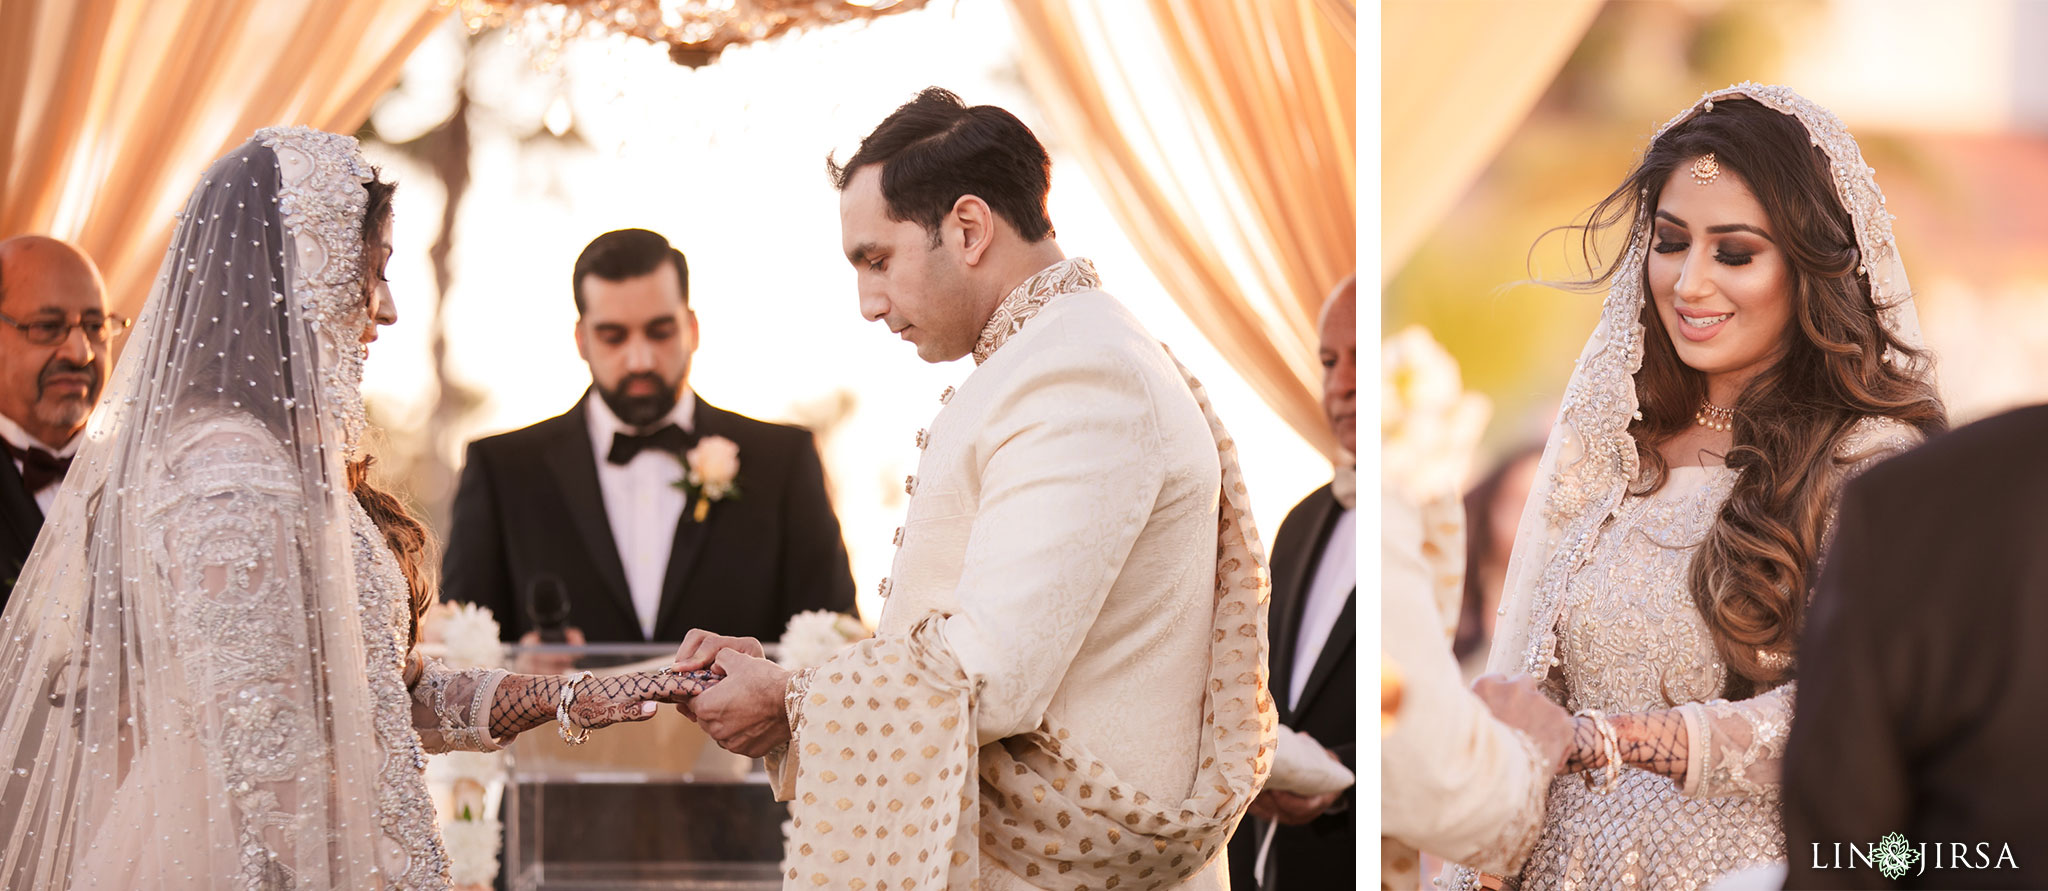 25 pasea hotel spa huntington beach muslim wedding ceremony photography